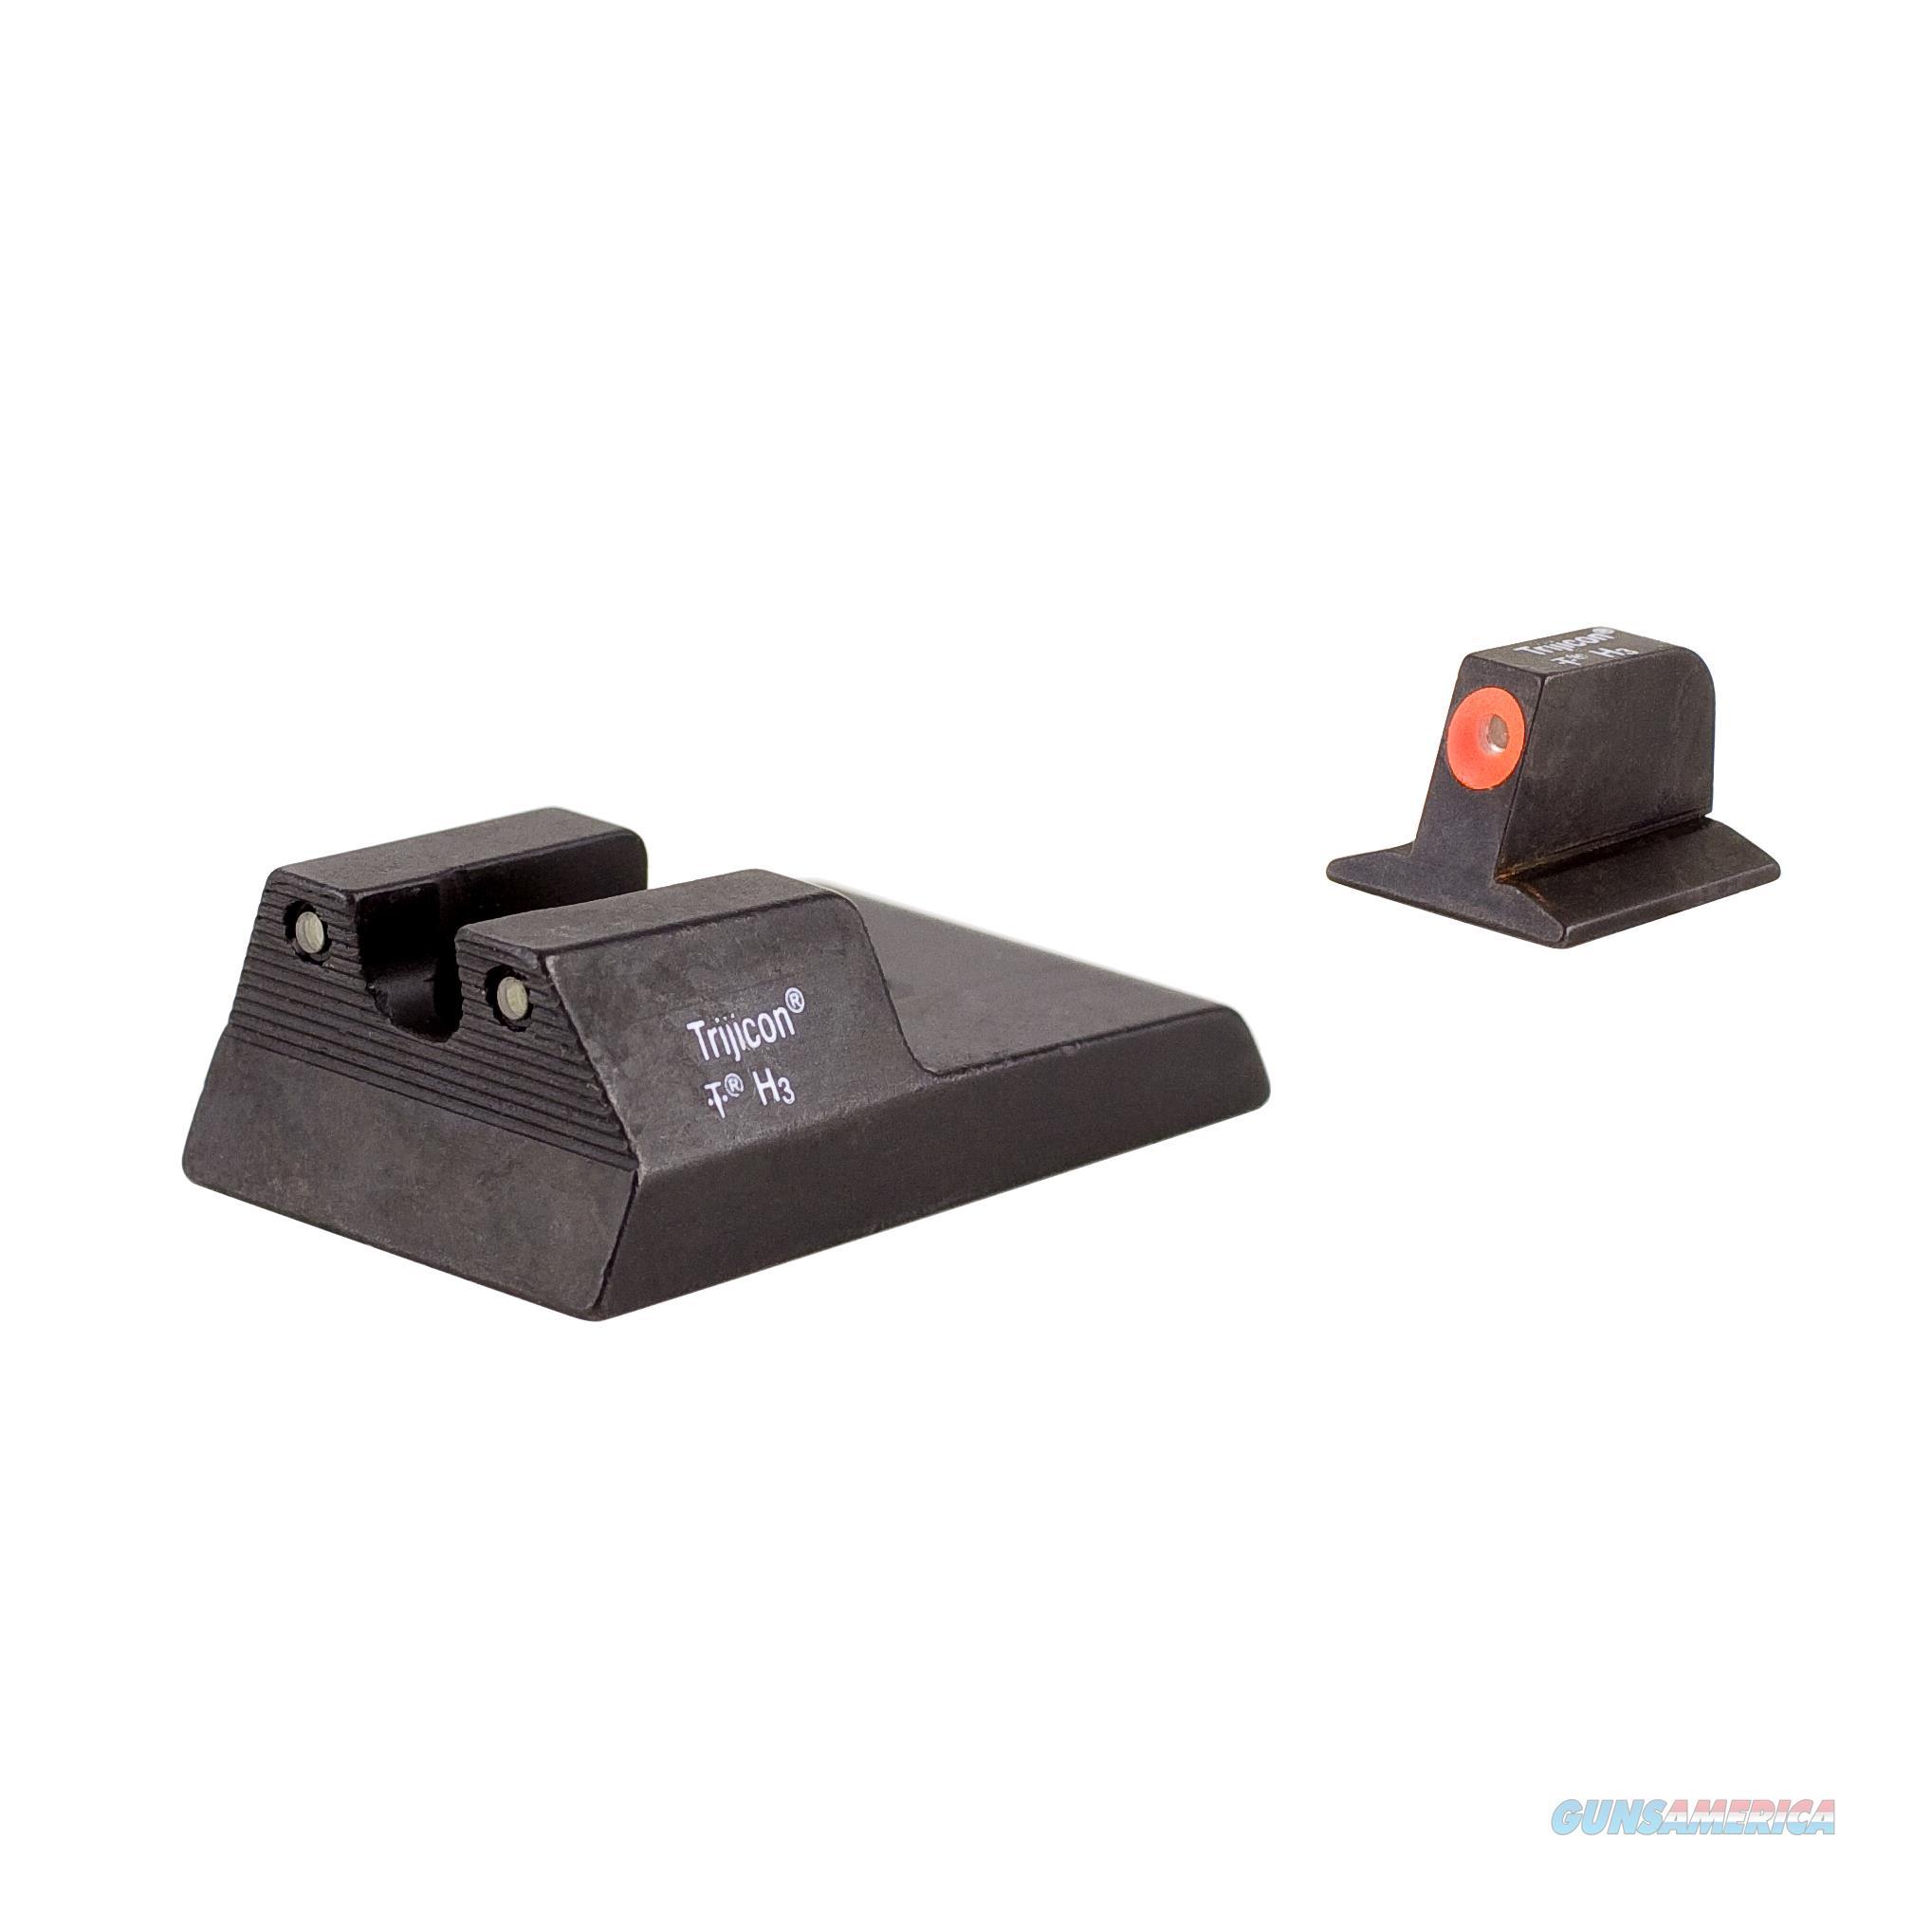 Trius Products Ruger Hd Night Sight Set RA114O  Non-Guns > Iron/Metal/Peep Sights